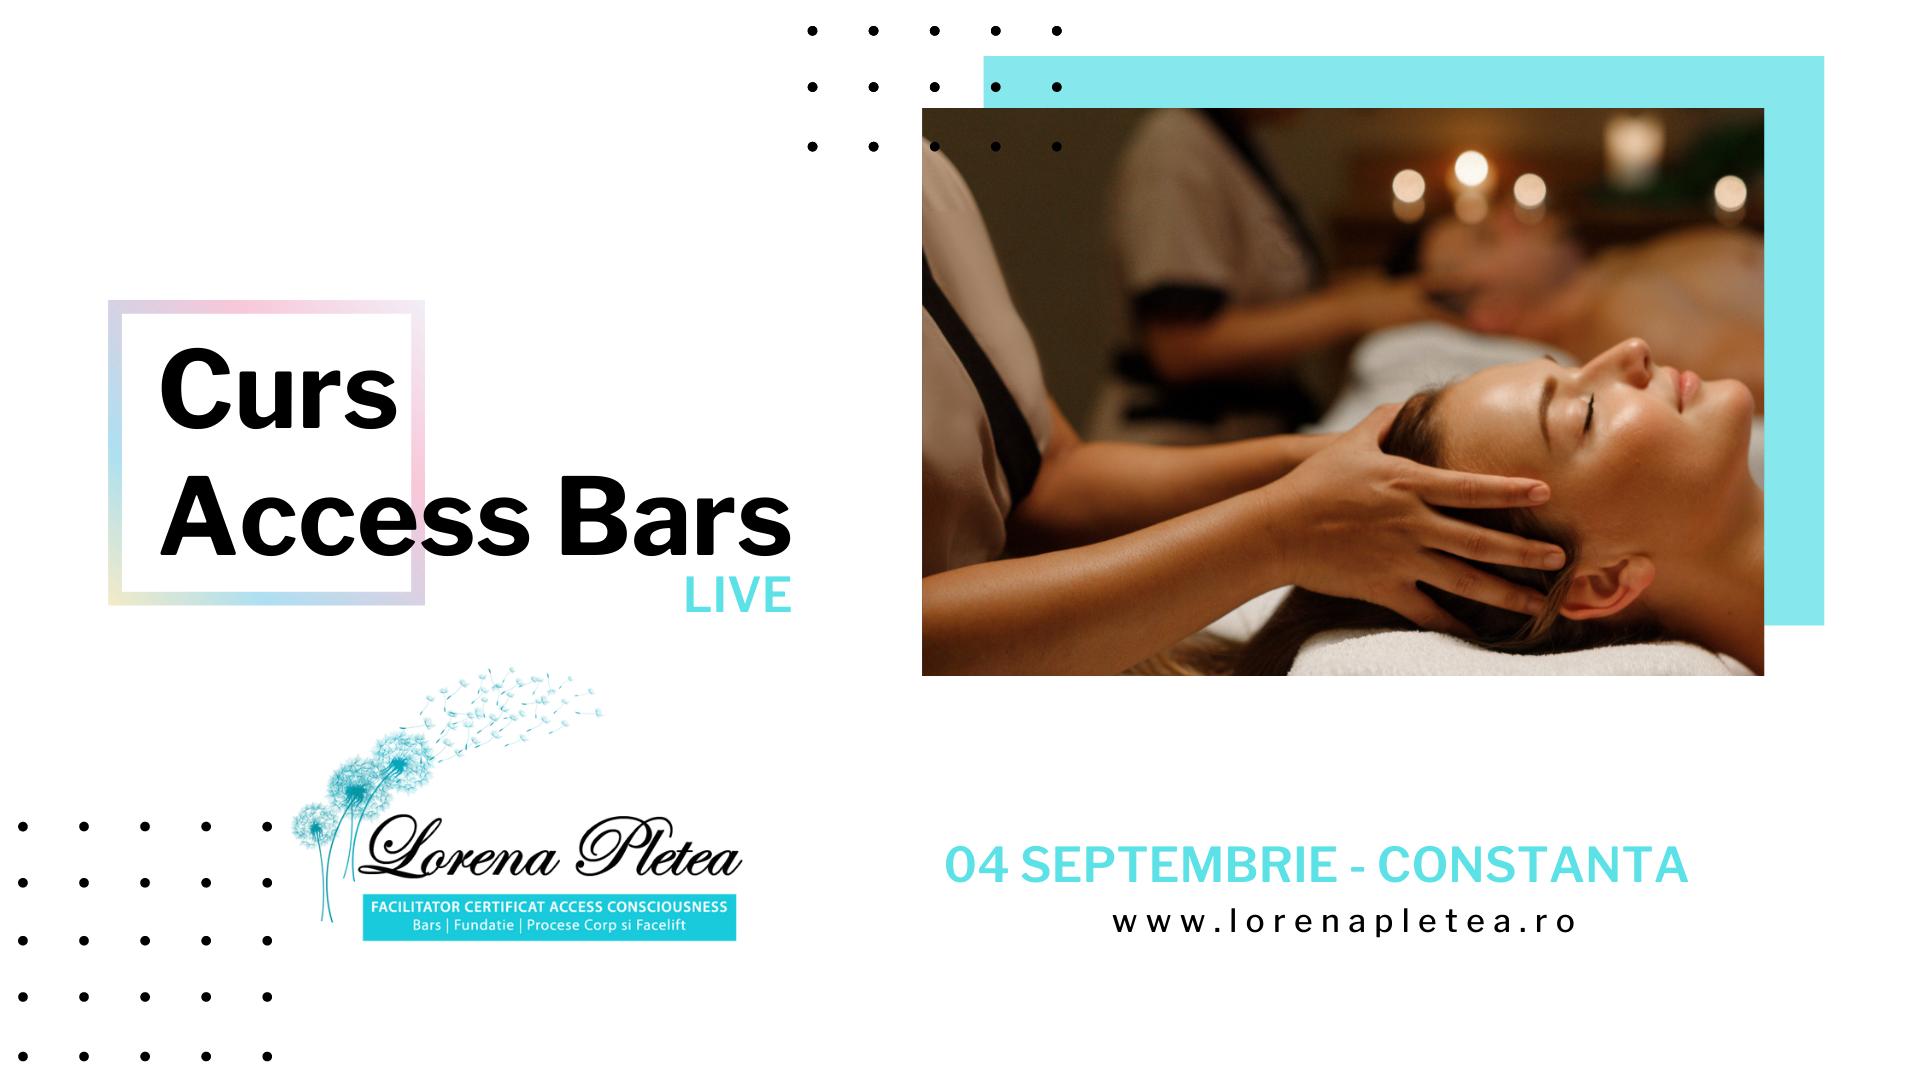 Curs Access Bars – 04 Septembrie, Constanta